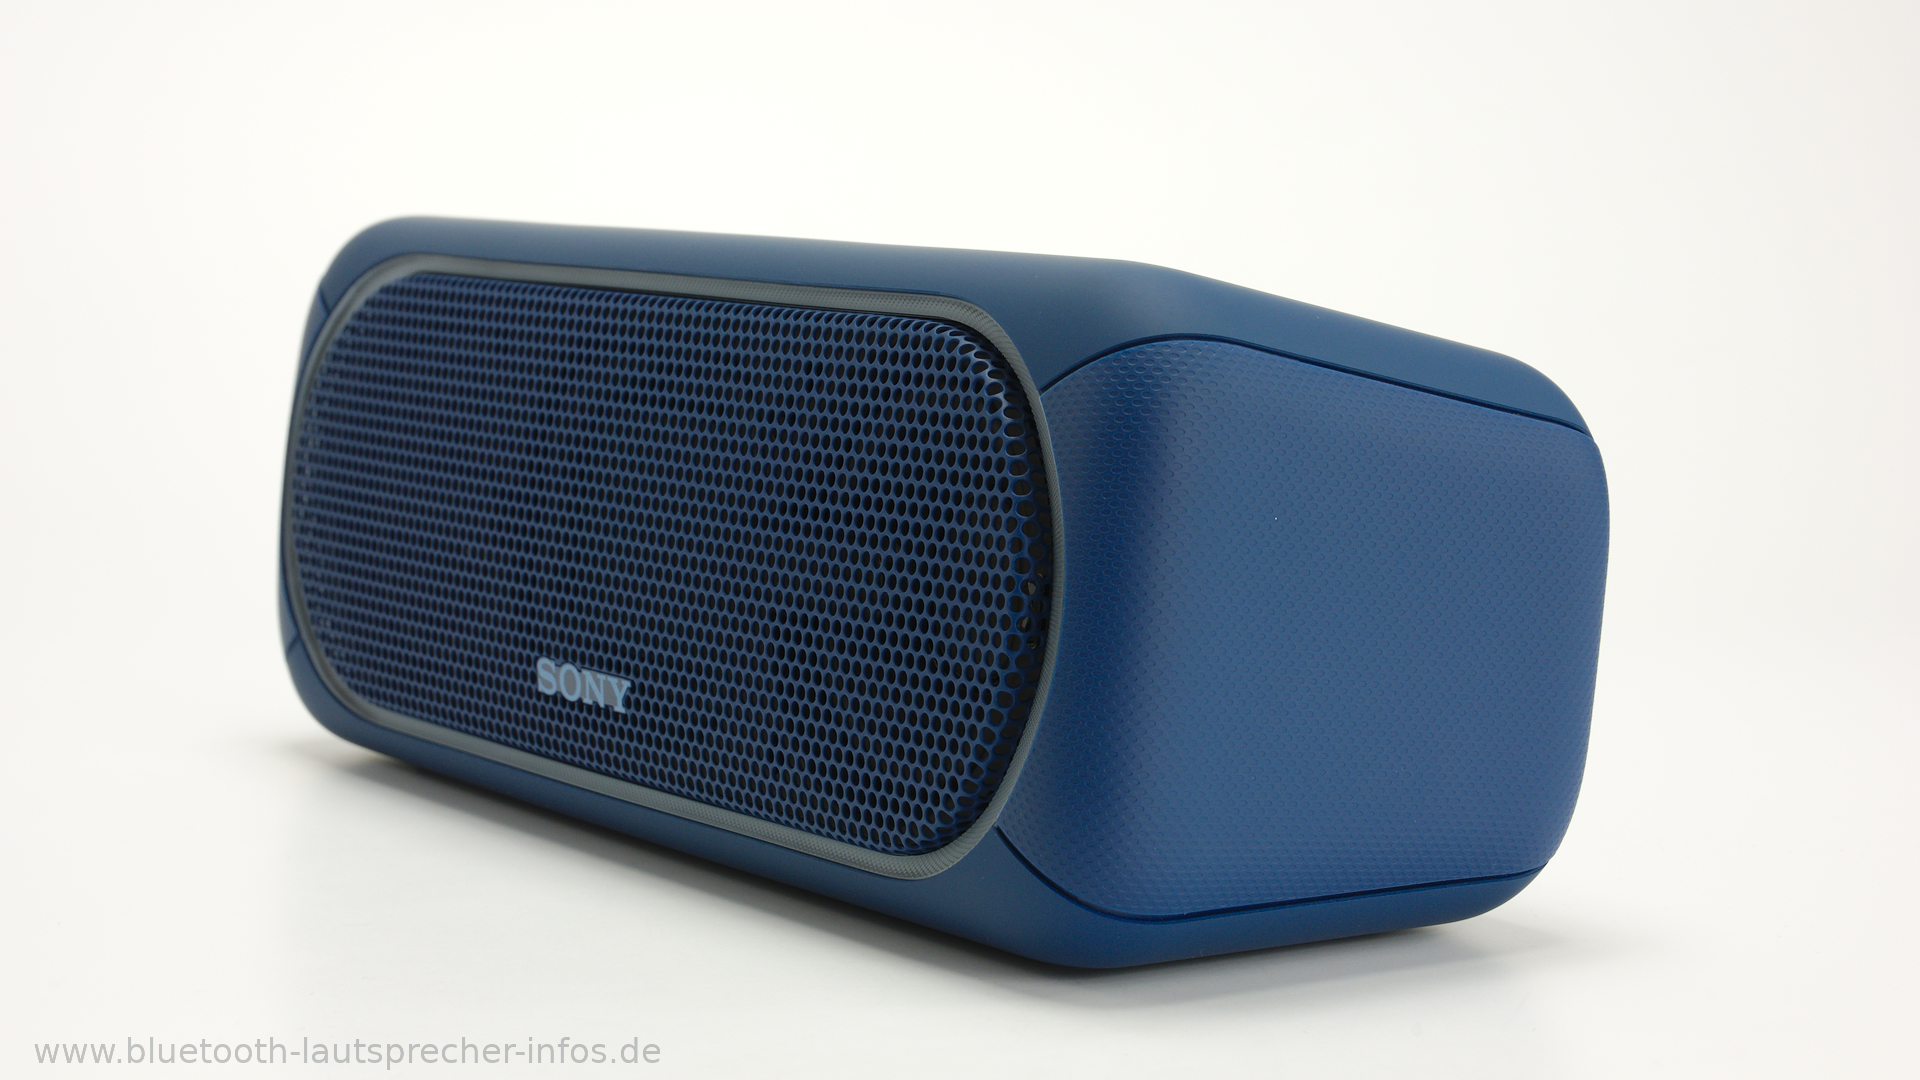 sony srs xb40 sehr guter bluetooth lautsprecher mit licht und extra bass bluetooth lautsprecher. Black Bedroom Furniture Sets. Home Design Ideas